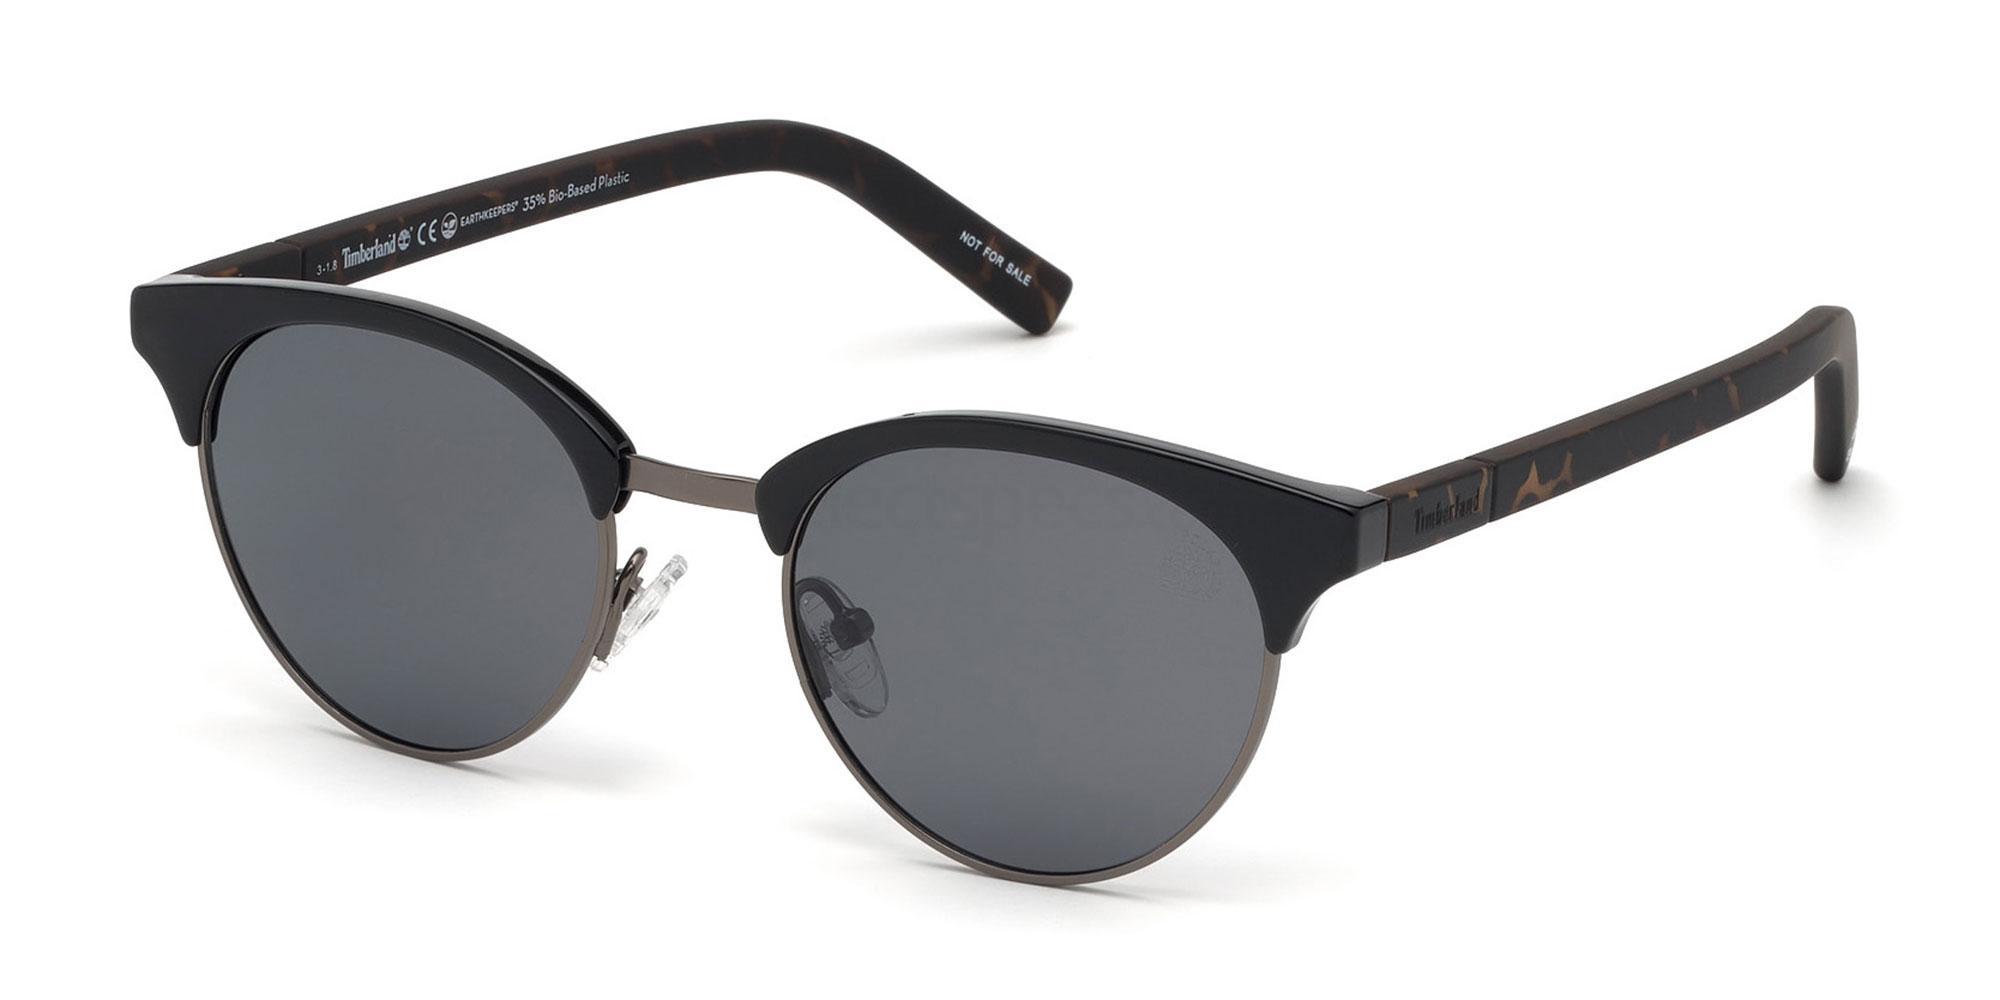 01D TB9147 Sunglasses, Timberland